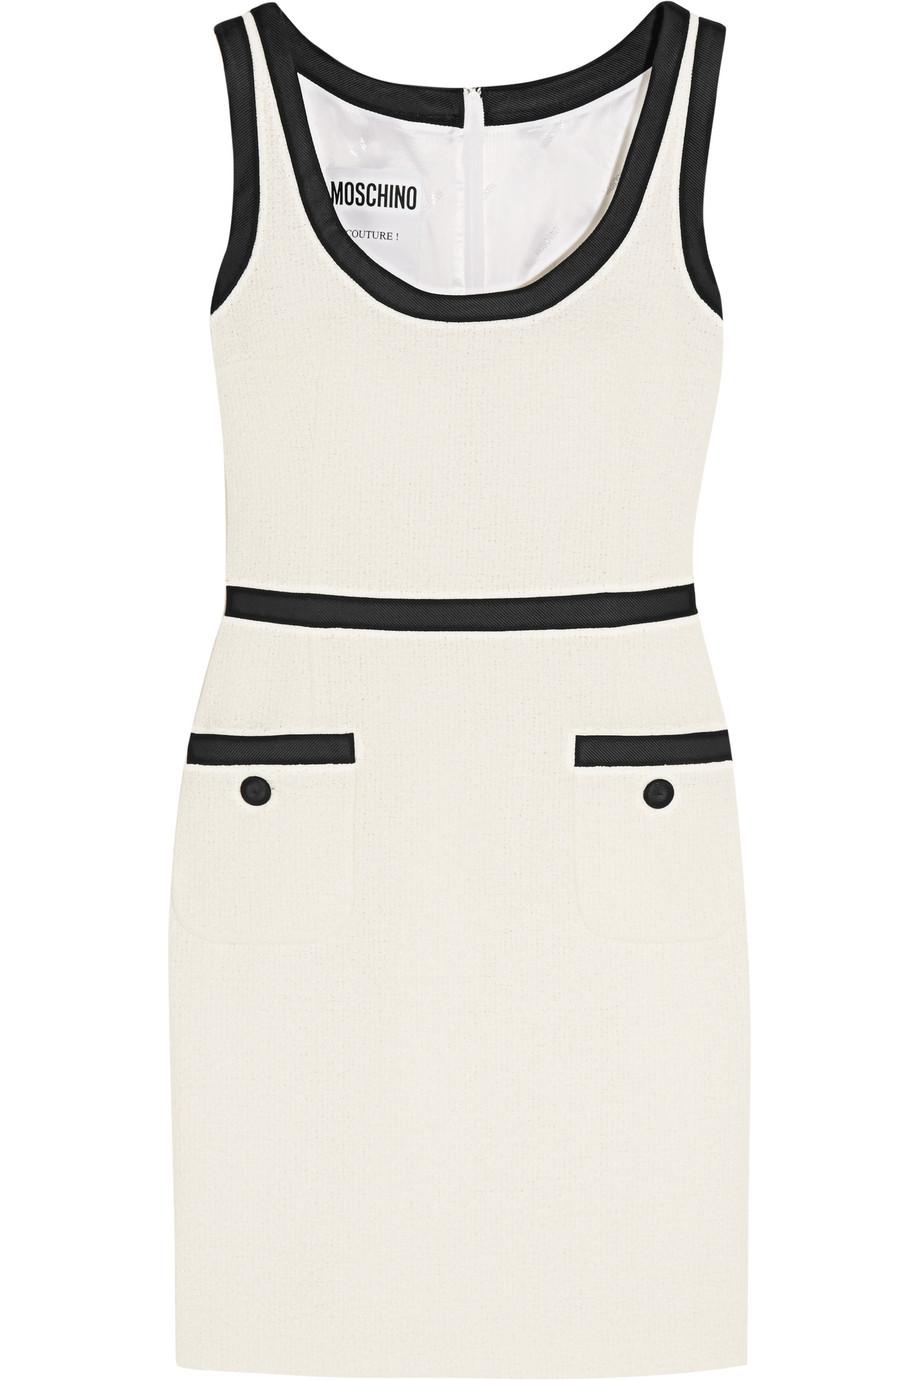 Moschino Satin Twill-Trimmed Cotton-Blend Bouclé-Tweed Mini Dress, Off-White, Women's, Size: 42